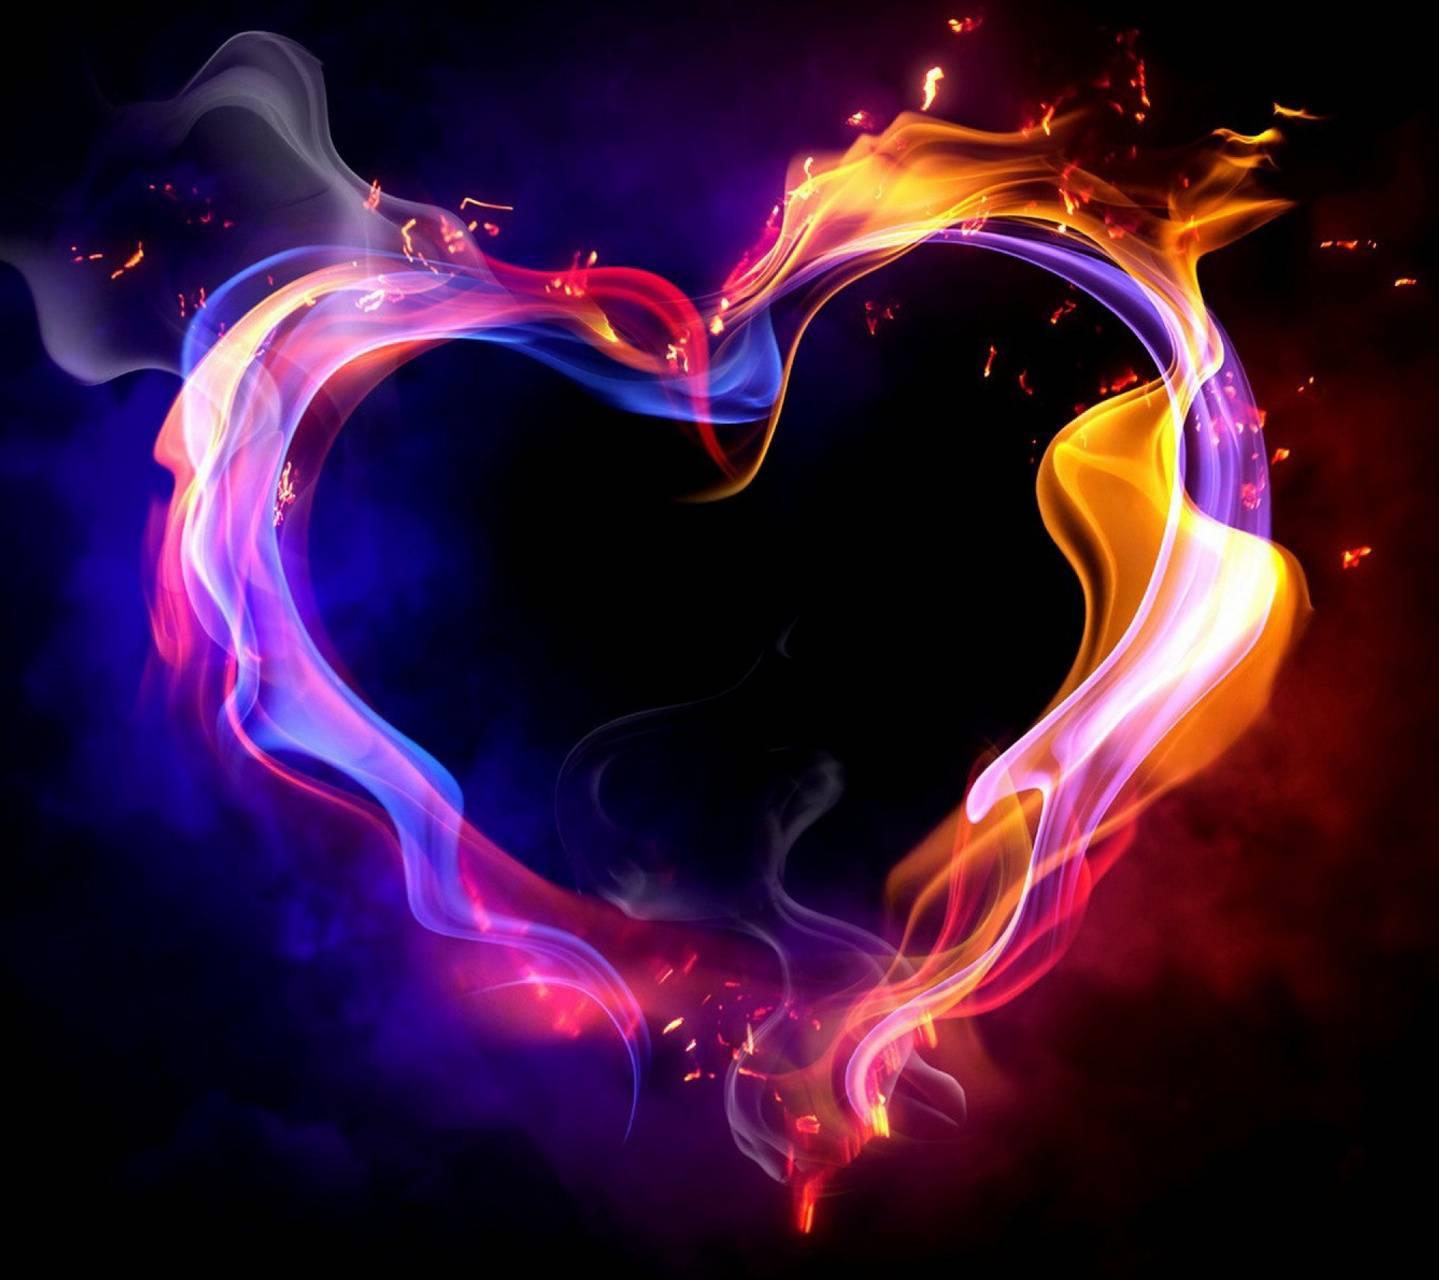 Fire Heart Love